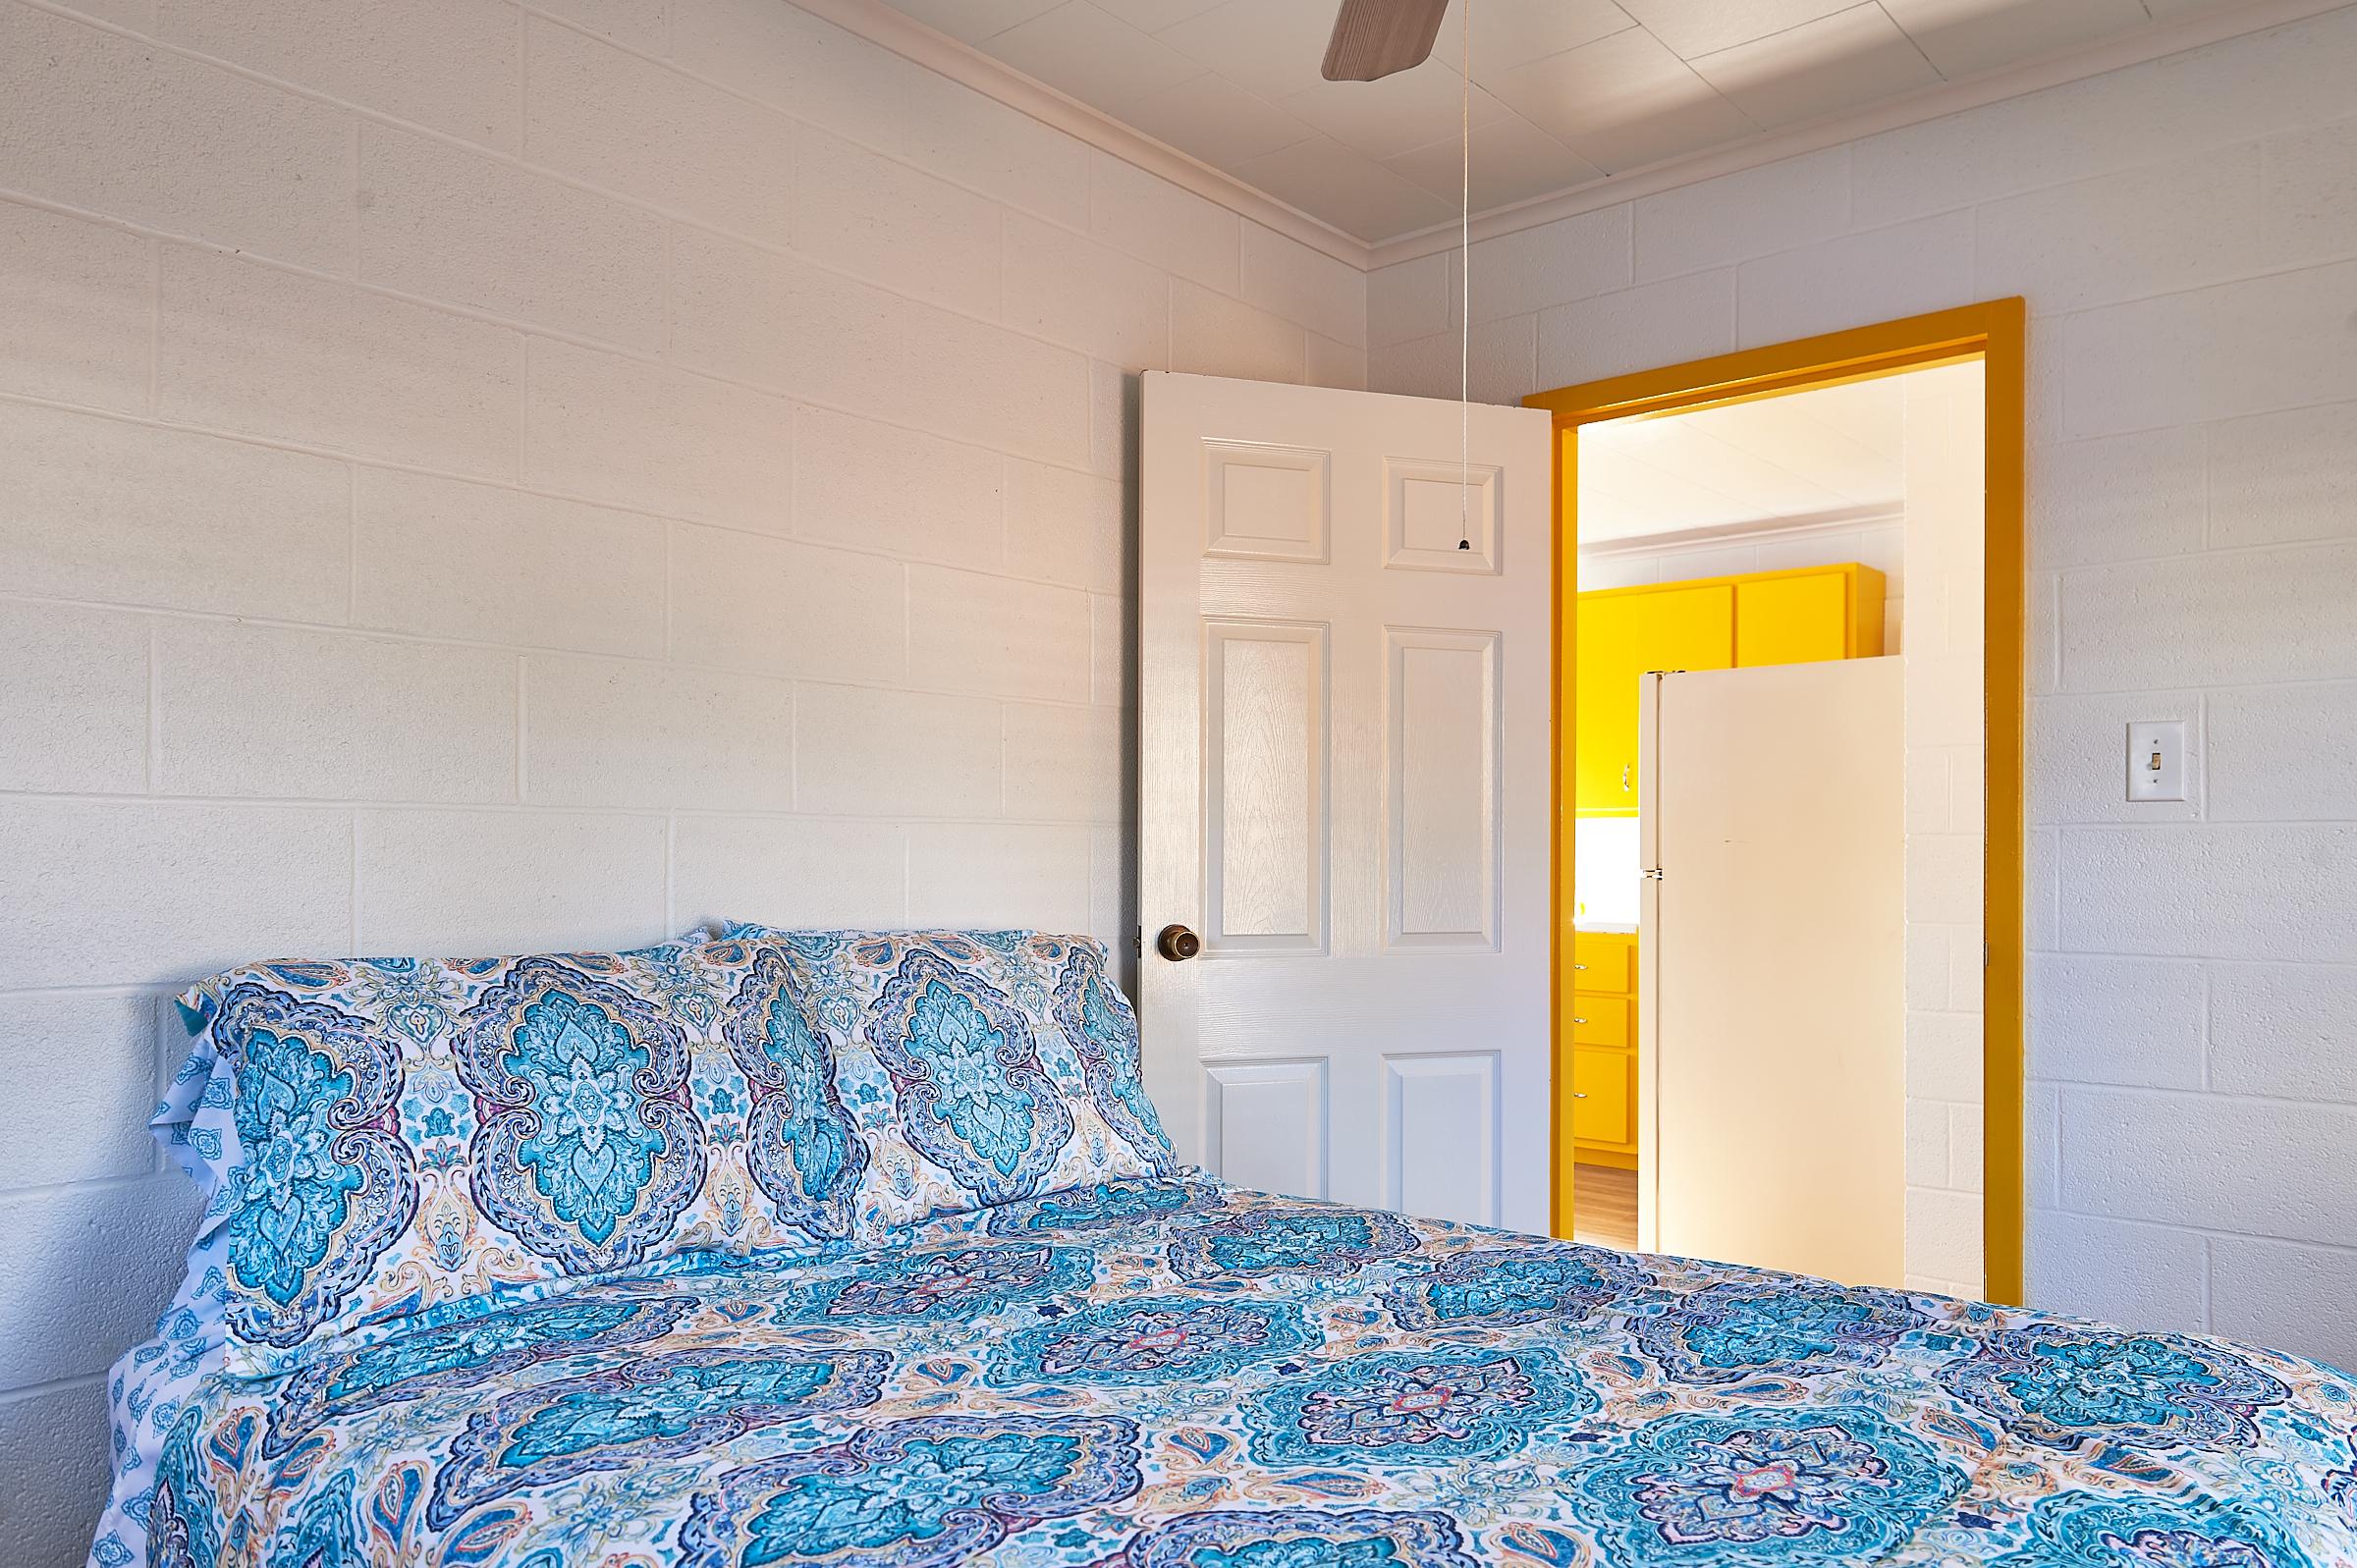 Bluebonnet Cabin Spare Bedroom Image 6